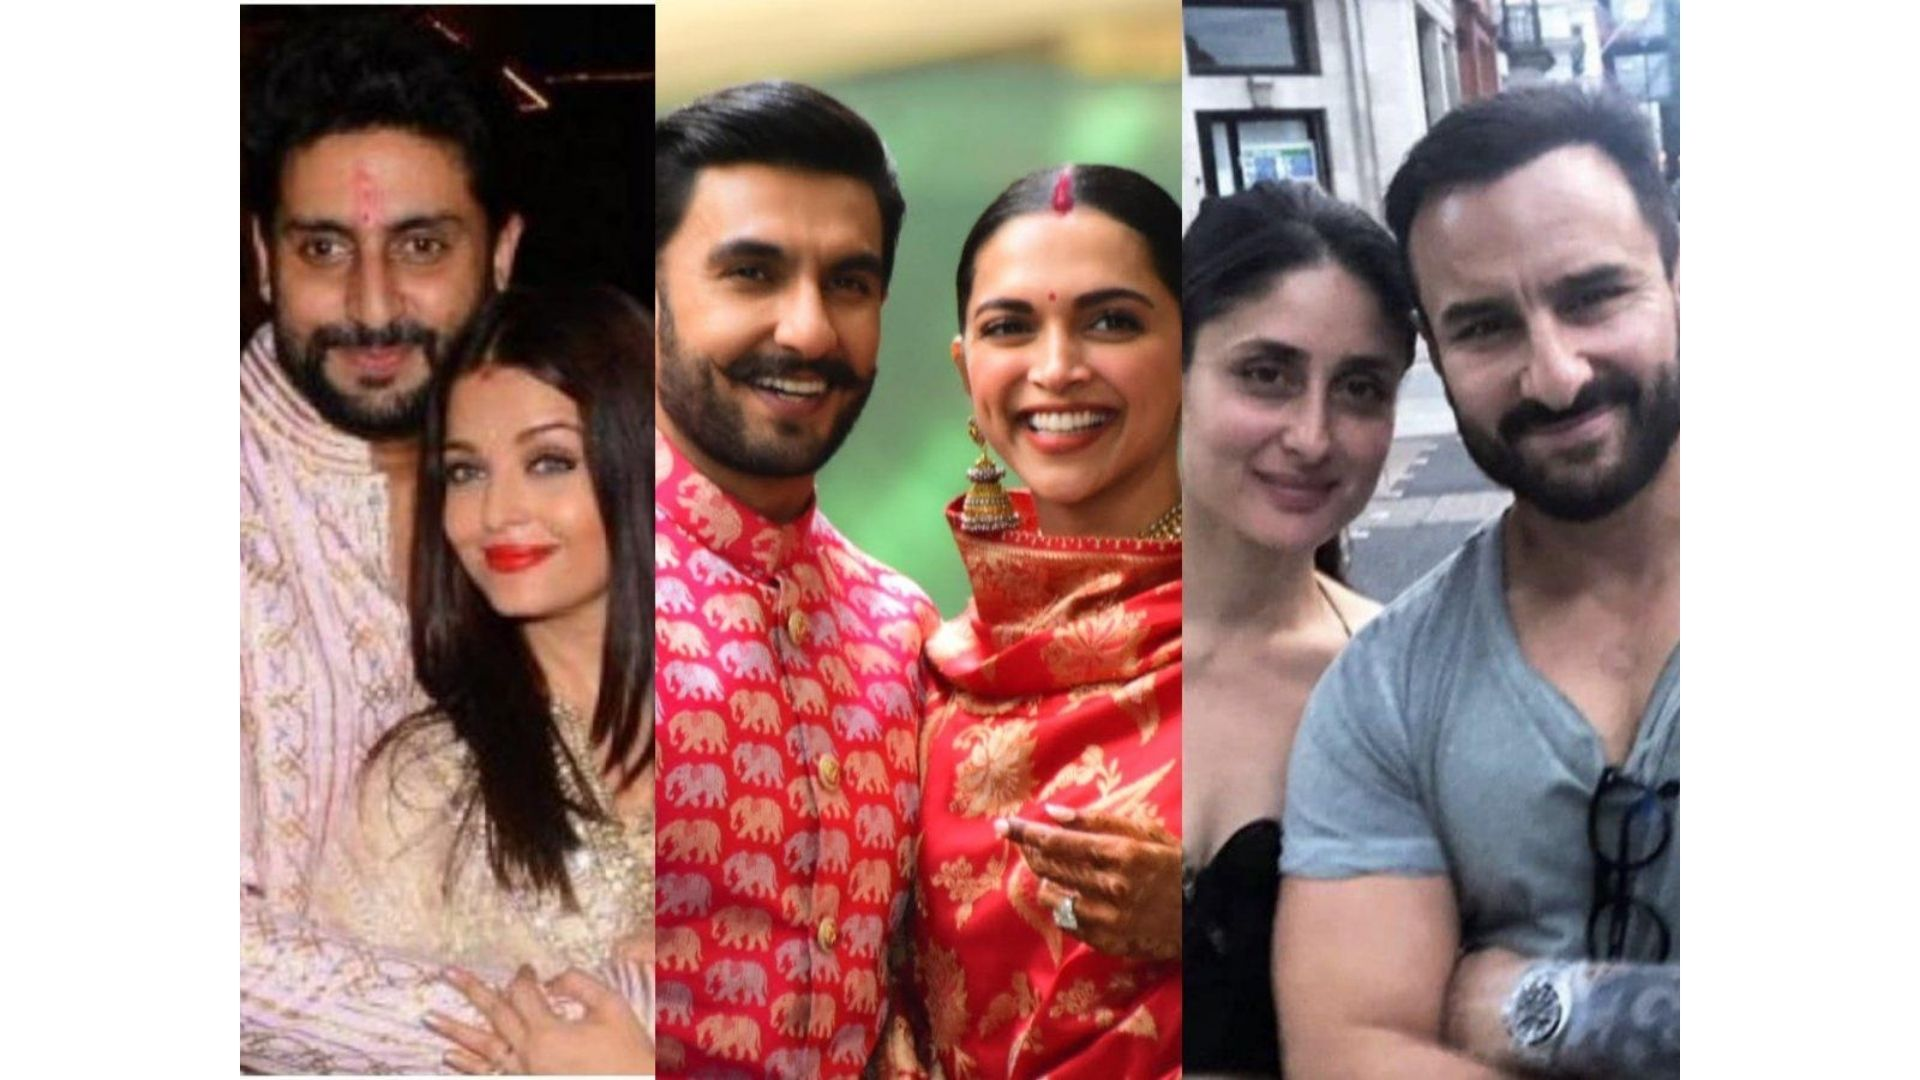 Deepika Padukone, Saif Ali Khan And Abhishek Bachchan- Celebs Who Tied The Know With Their Co-Stars